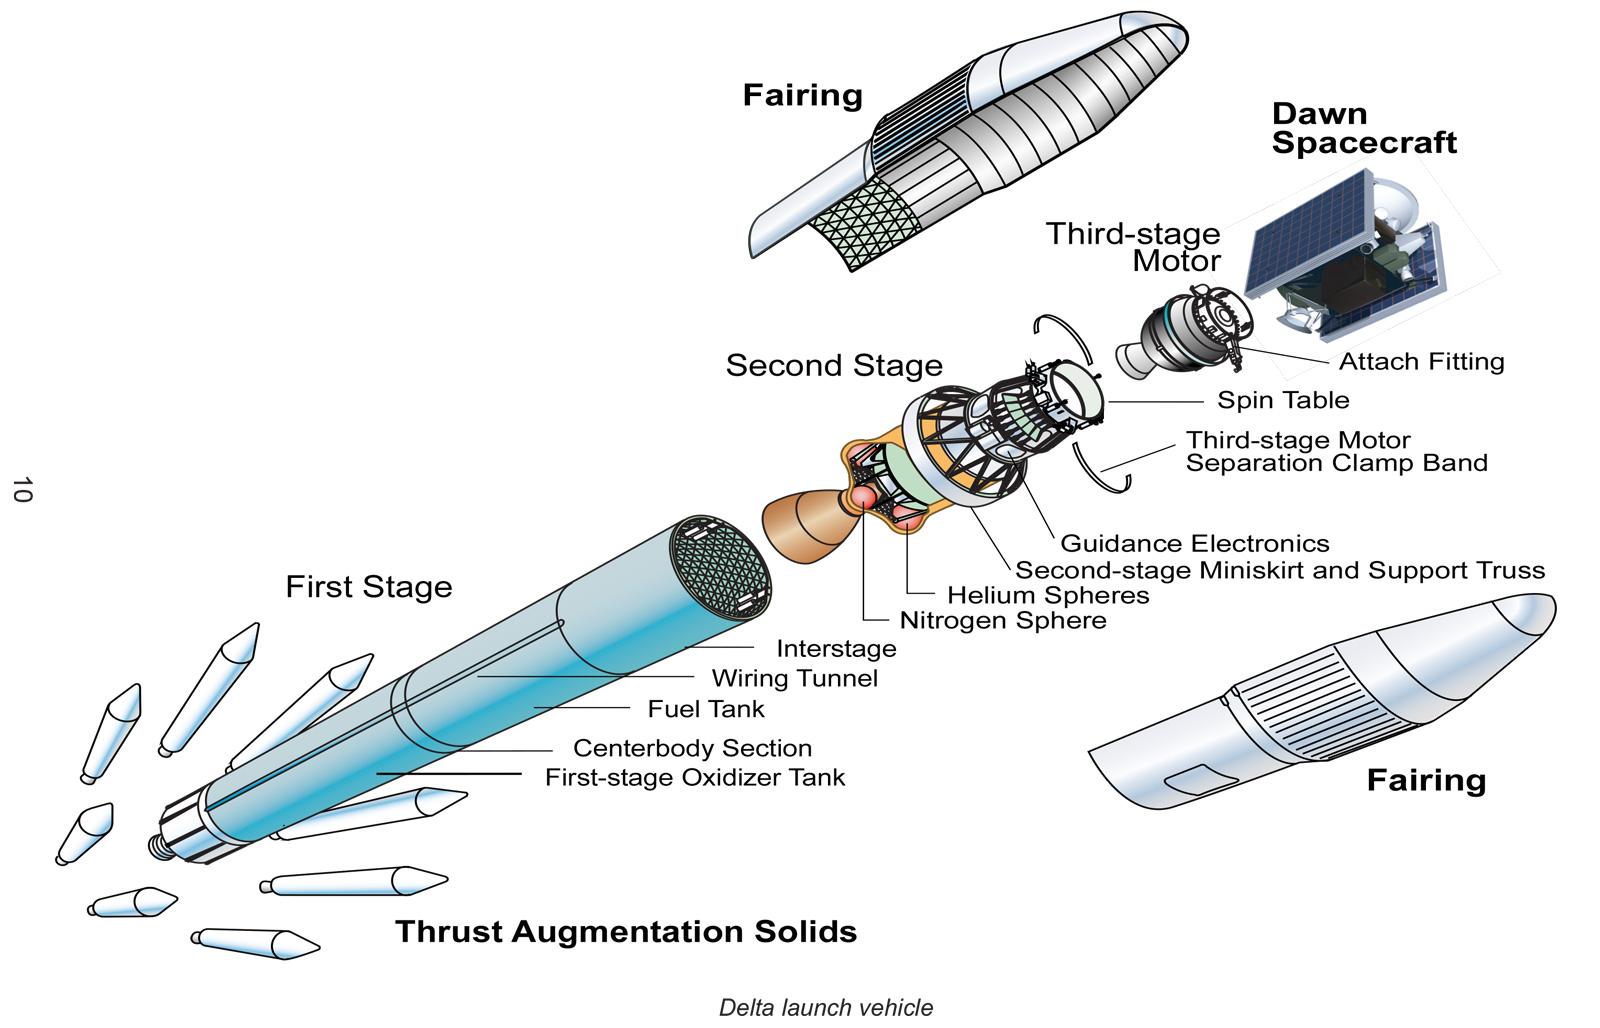 Dawn Launch Vehicle Diagram Solar System Exploration Nasa Science Wiring Basics